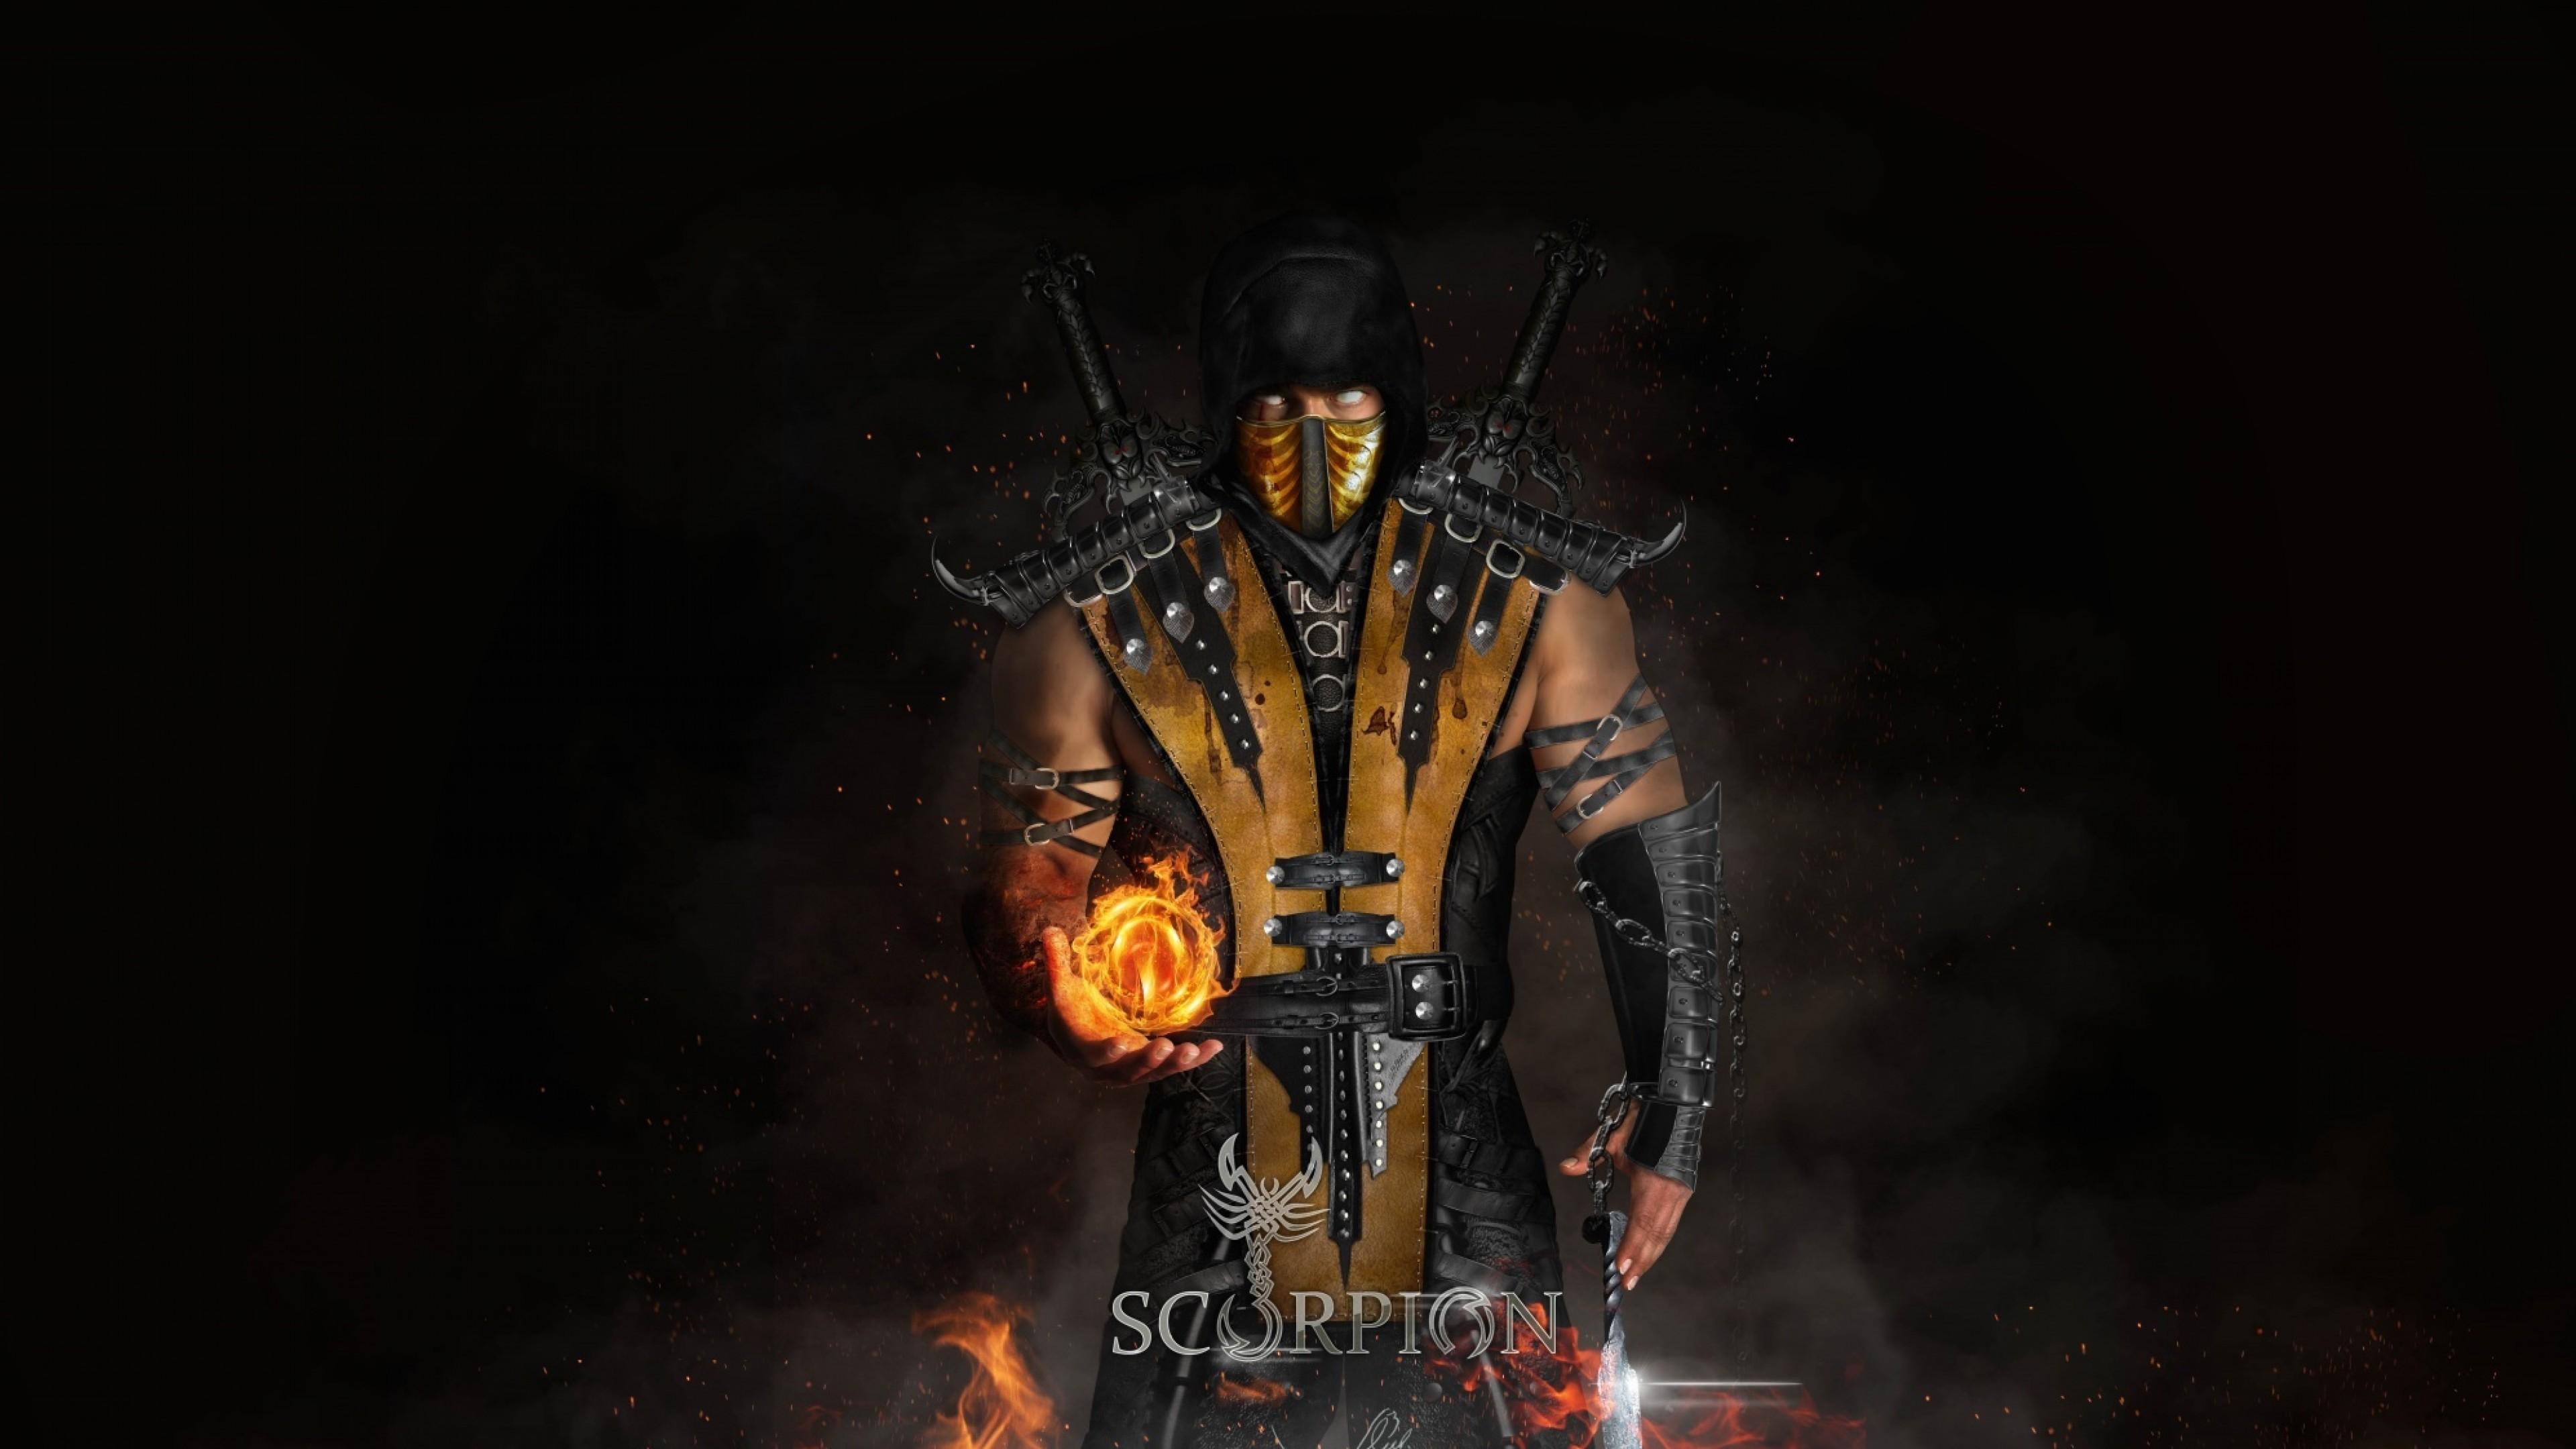 Scorpion Cool Mortal Kombat X Hd Wallpaper For Desktop And Mobiles 4k Ultra Hd Hd Wallpaper Wallpapers Net